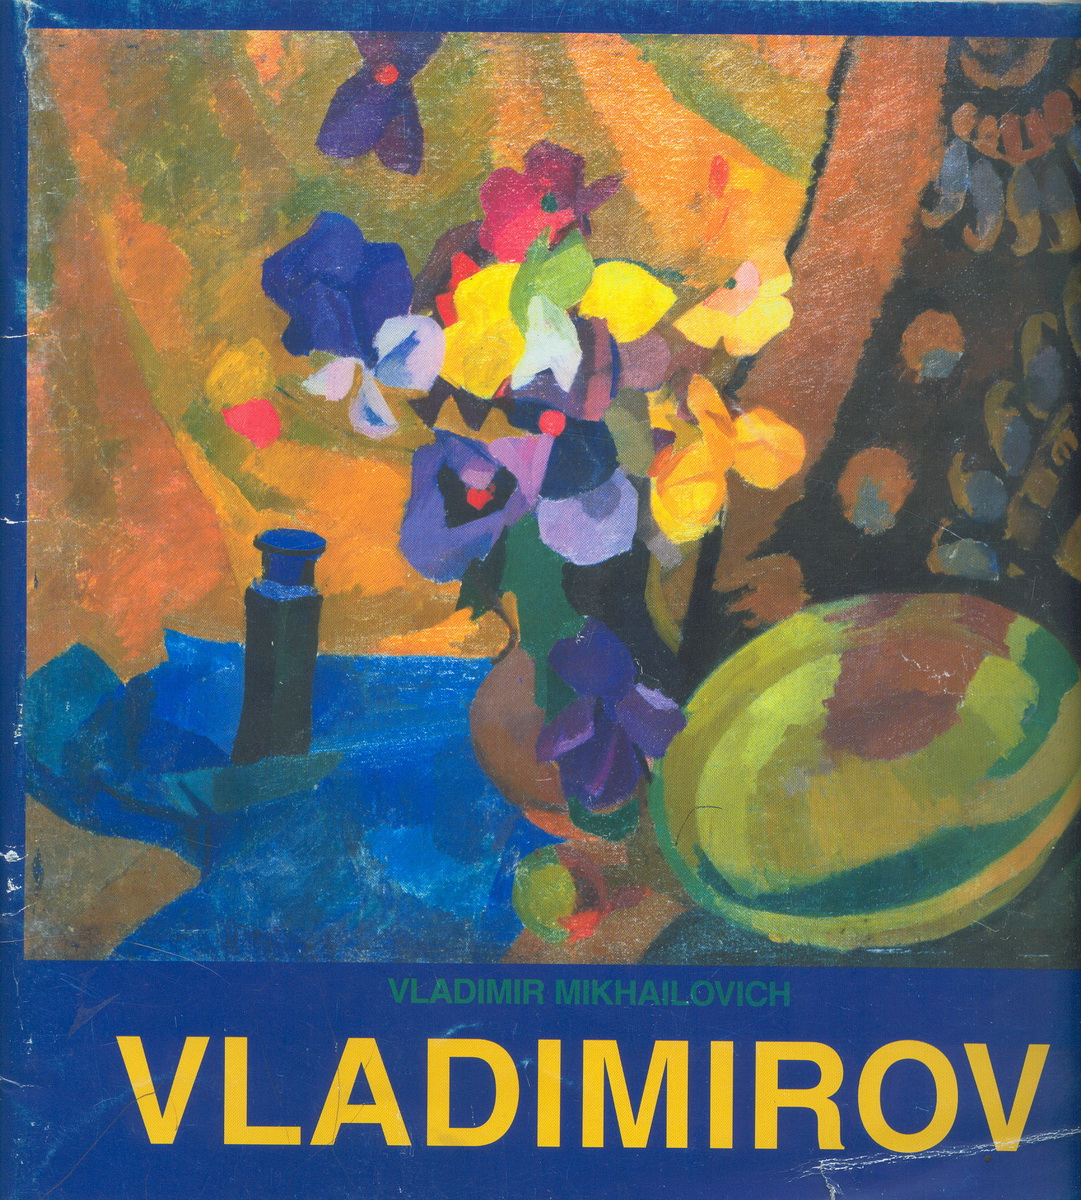 Vladimir Mikhailovich VLADIMIROV знаменитости в челябинске